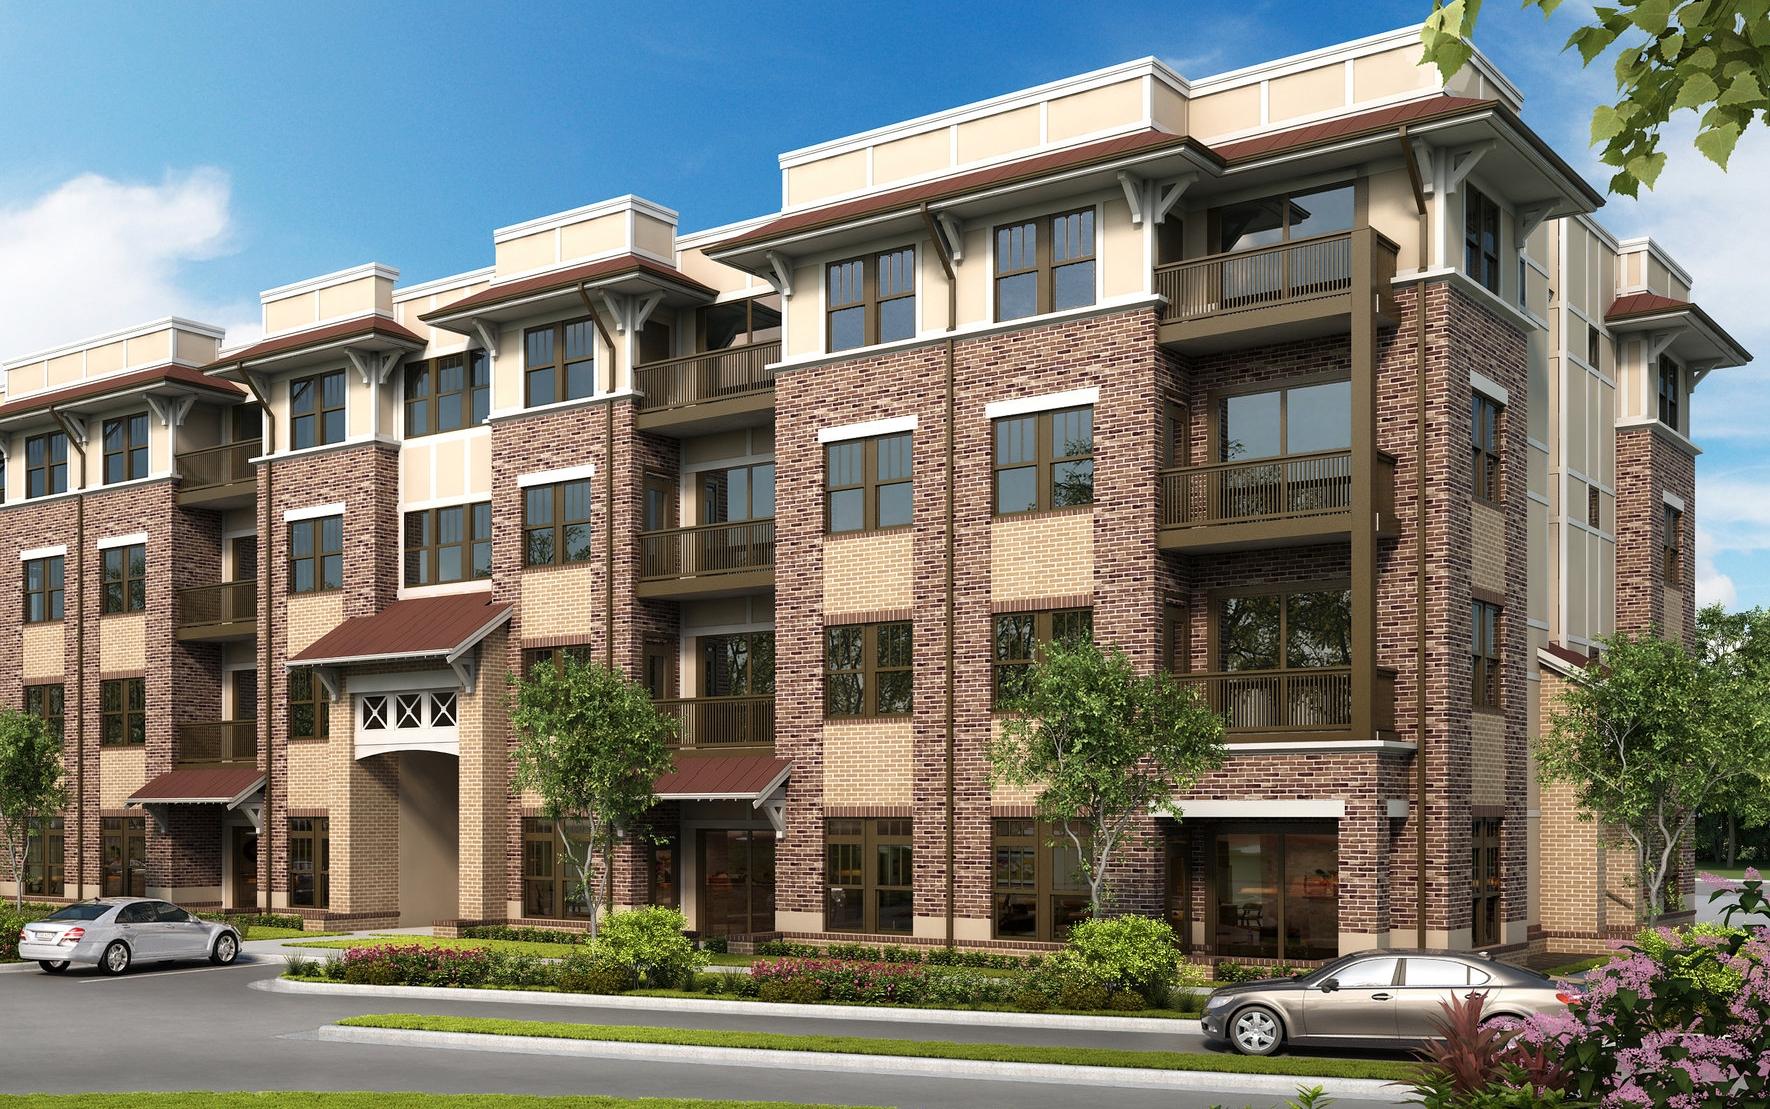 160408-IN_Riverwatch Apartments FINAL.jpg